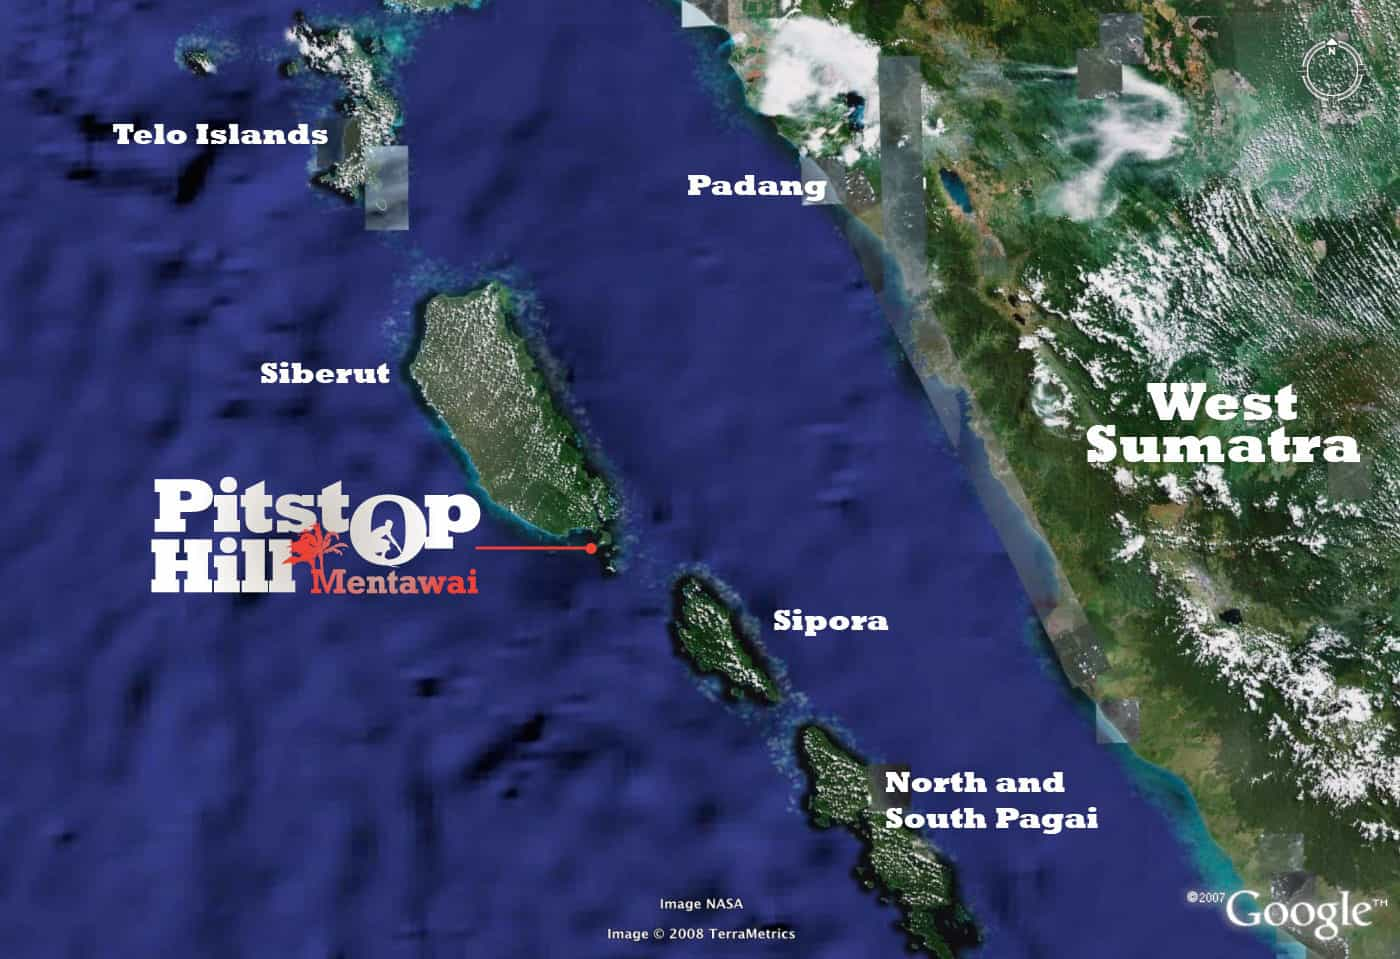 Pitstop Hill - Mentawai Map